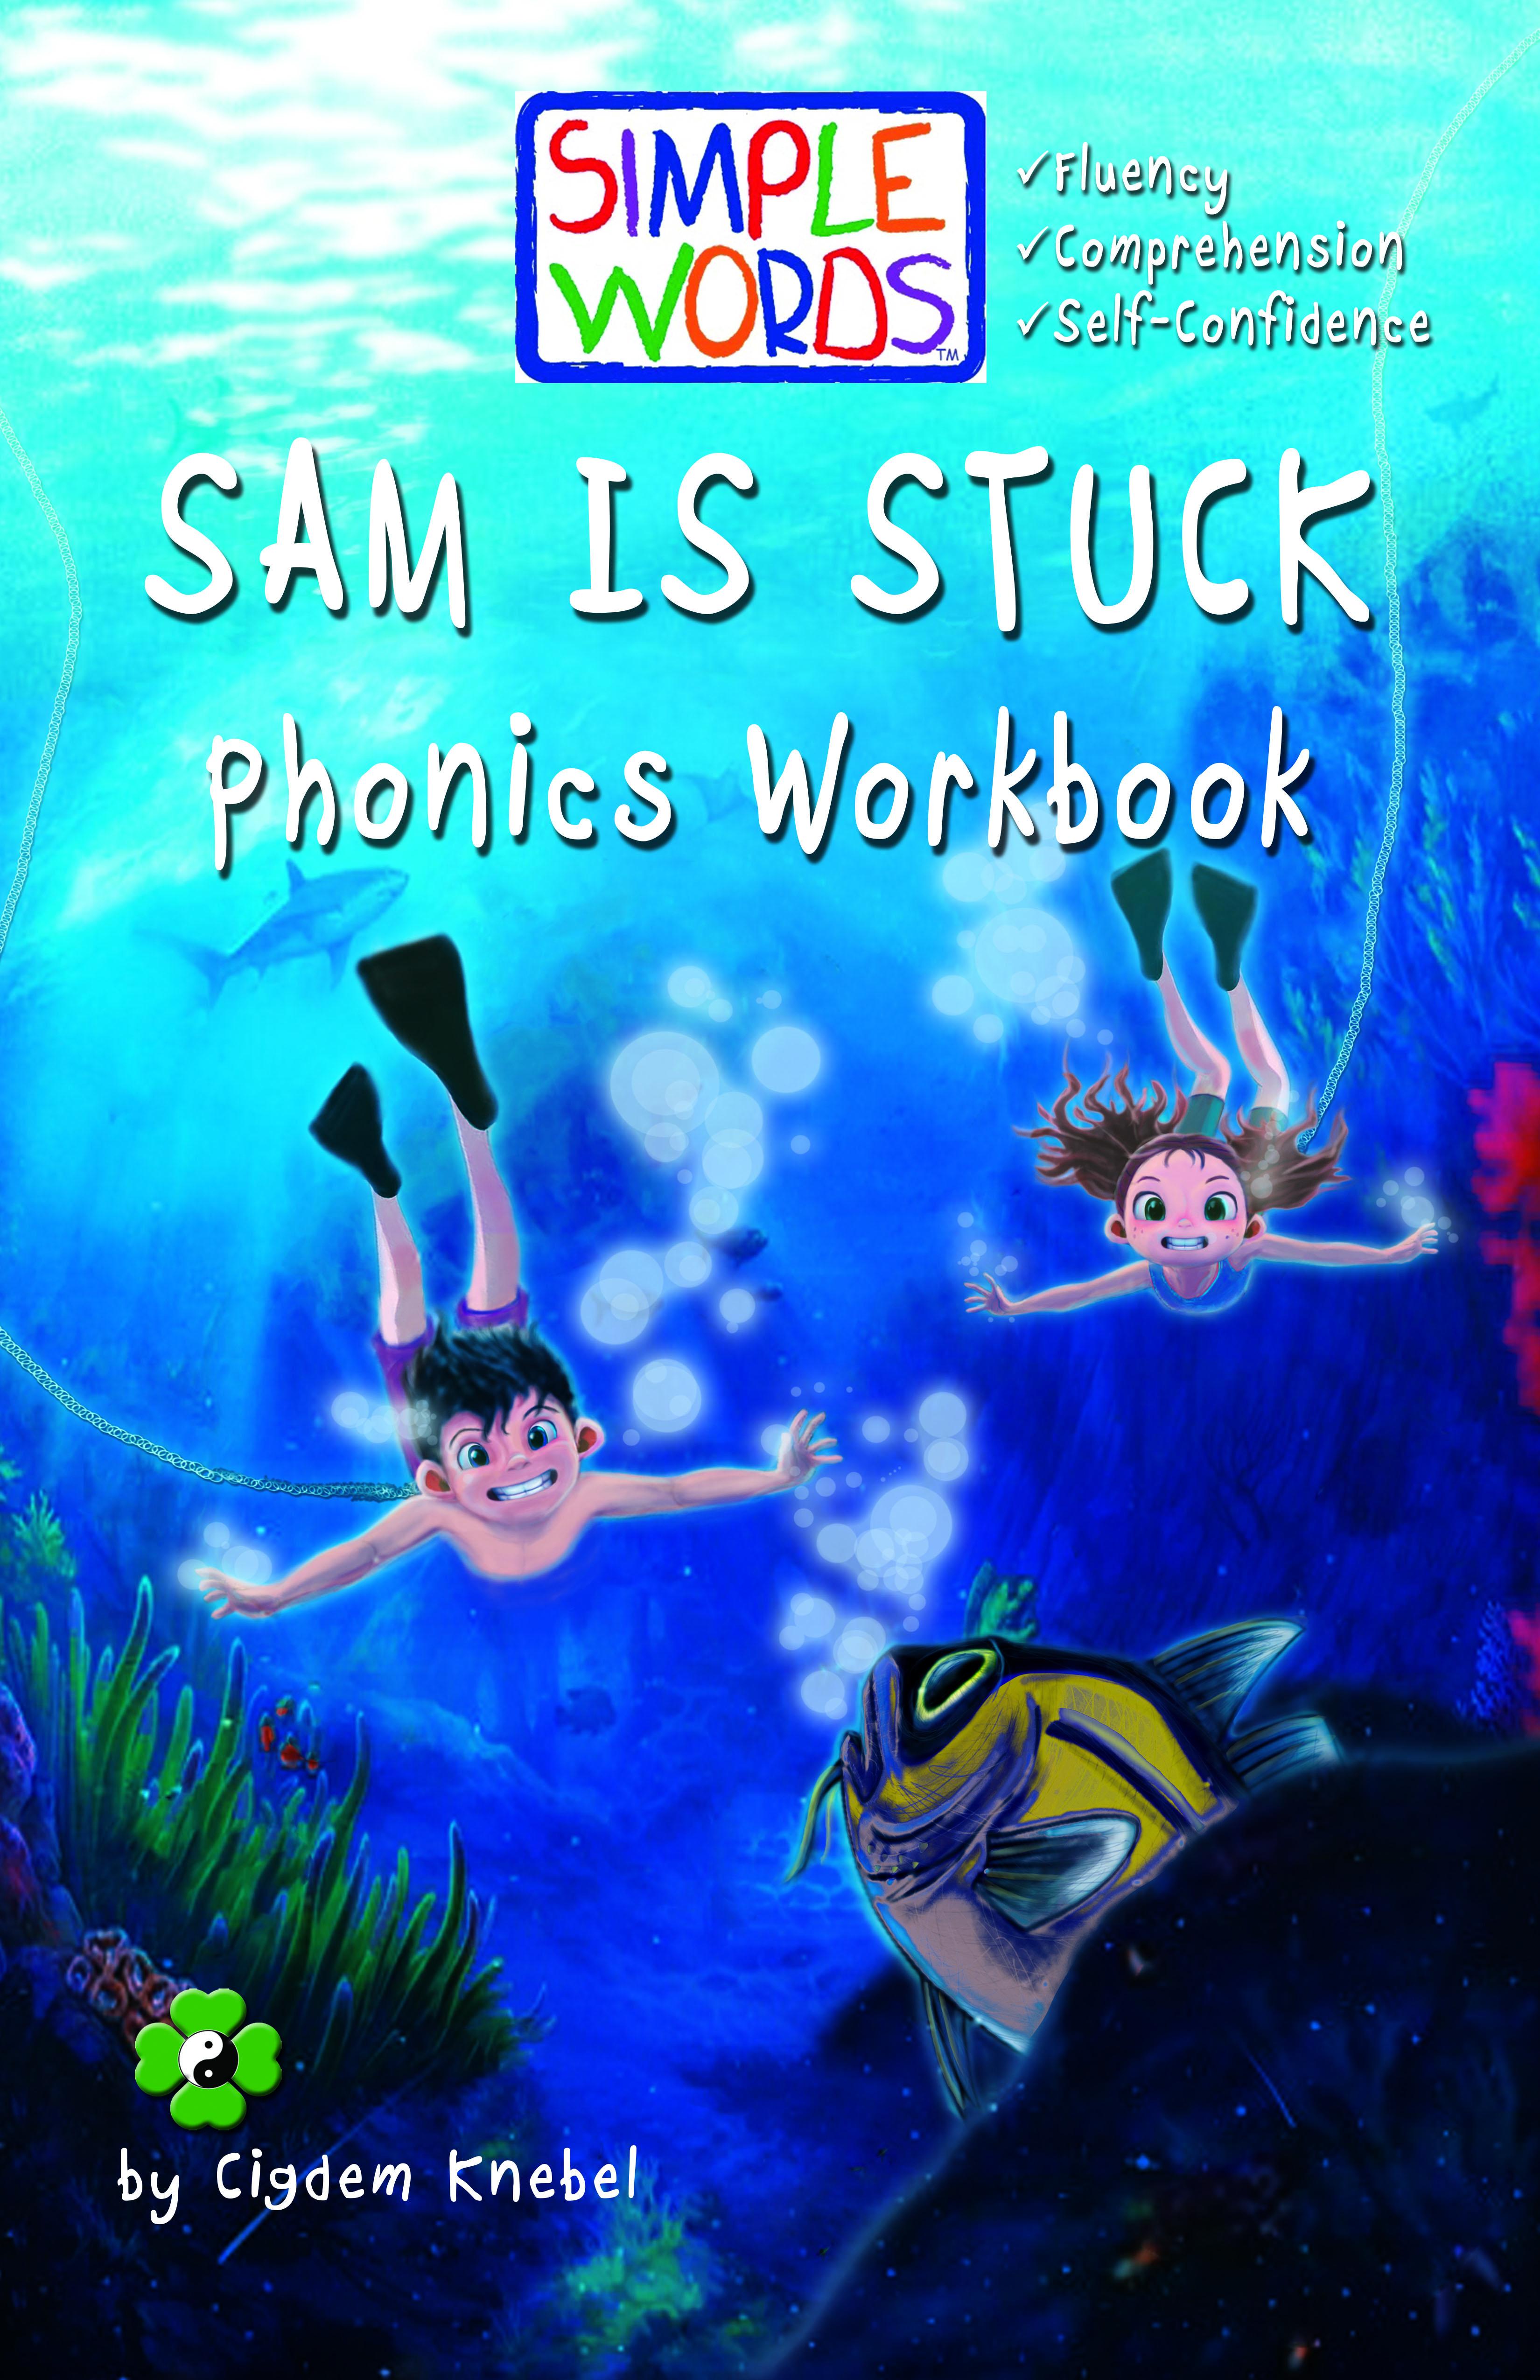 Phonics Workbook Cover